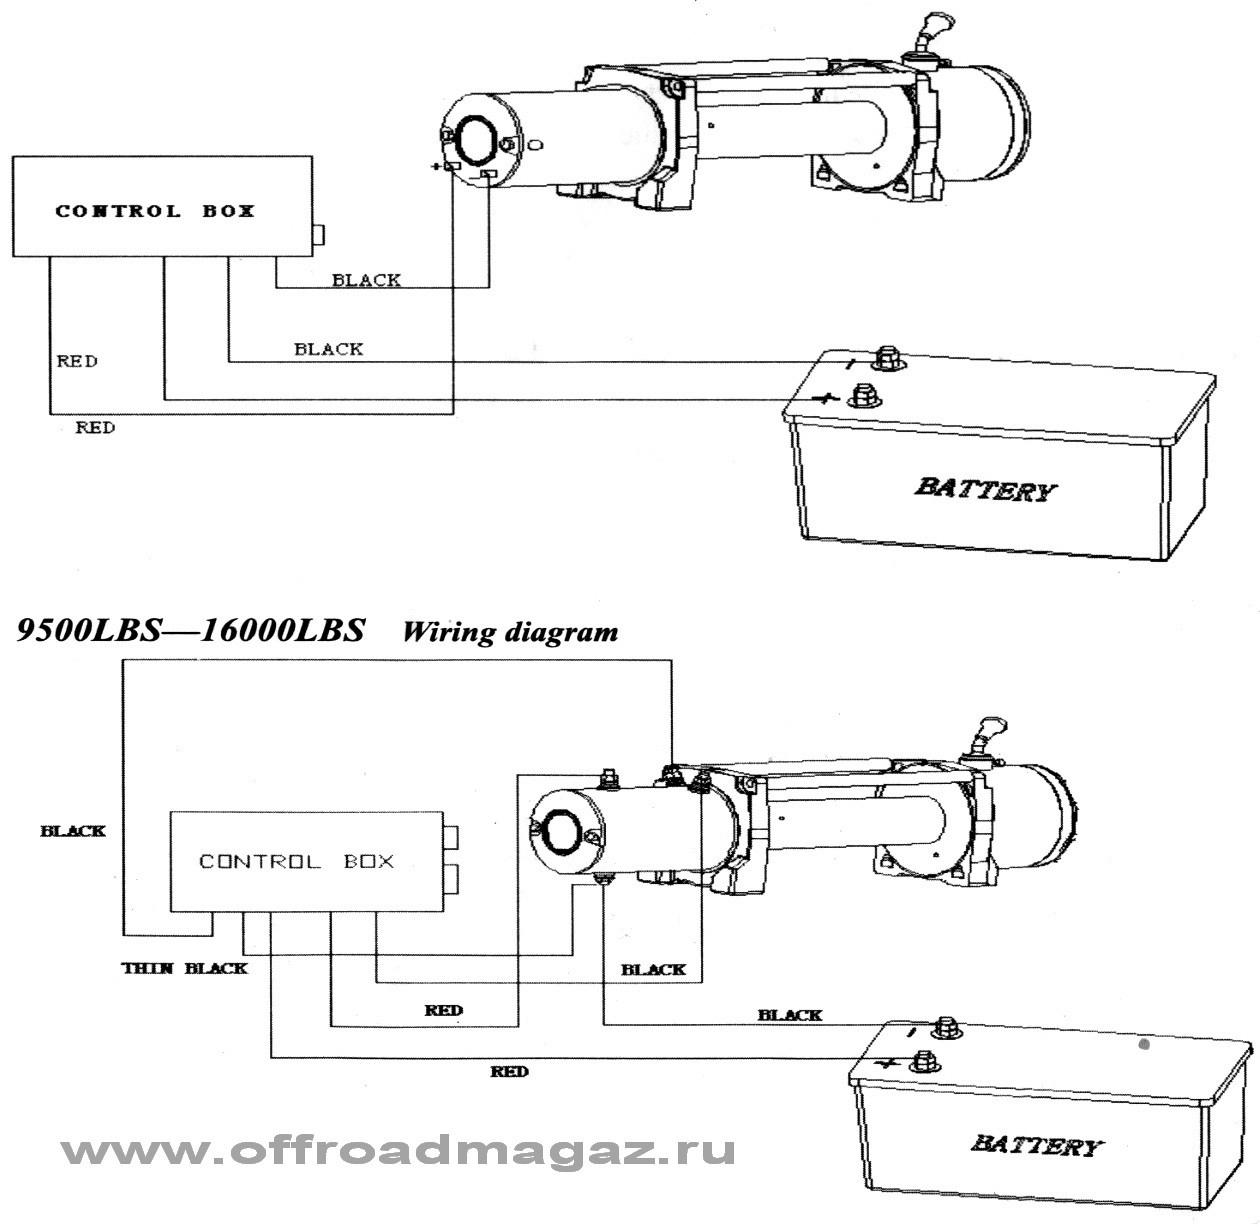 DK_3258] Warn Xd9000I Winch Wiring Diagram Free Picture Schematic WiringHopad Skat Peted Phae Mohammedshrine Librar Wiring 101